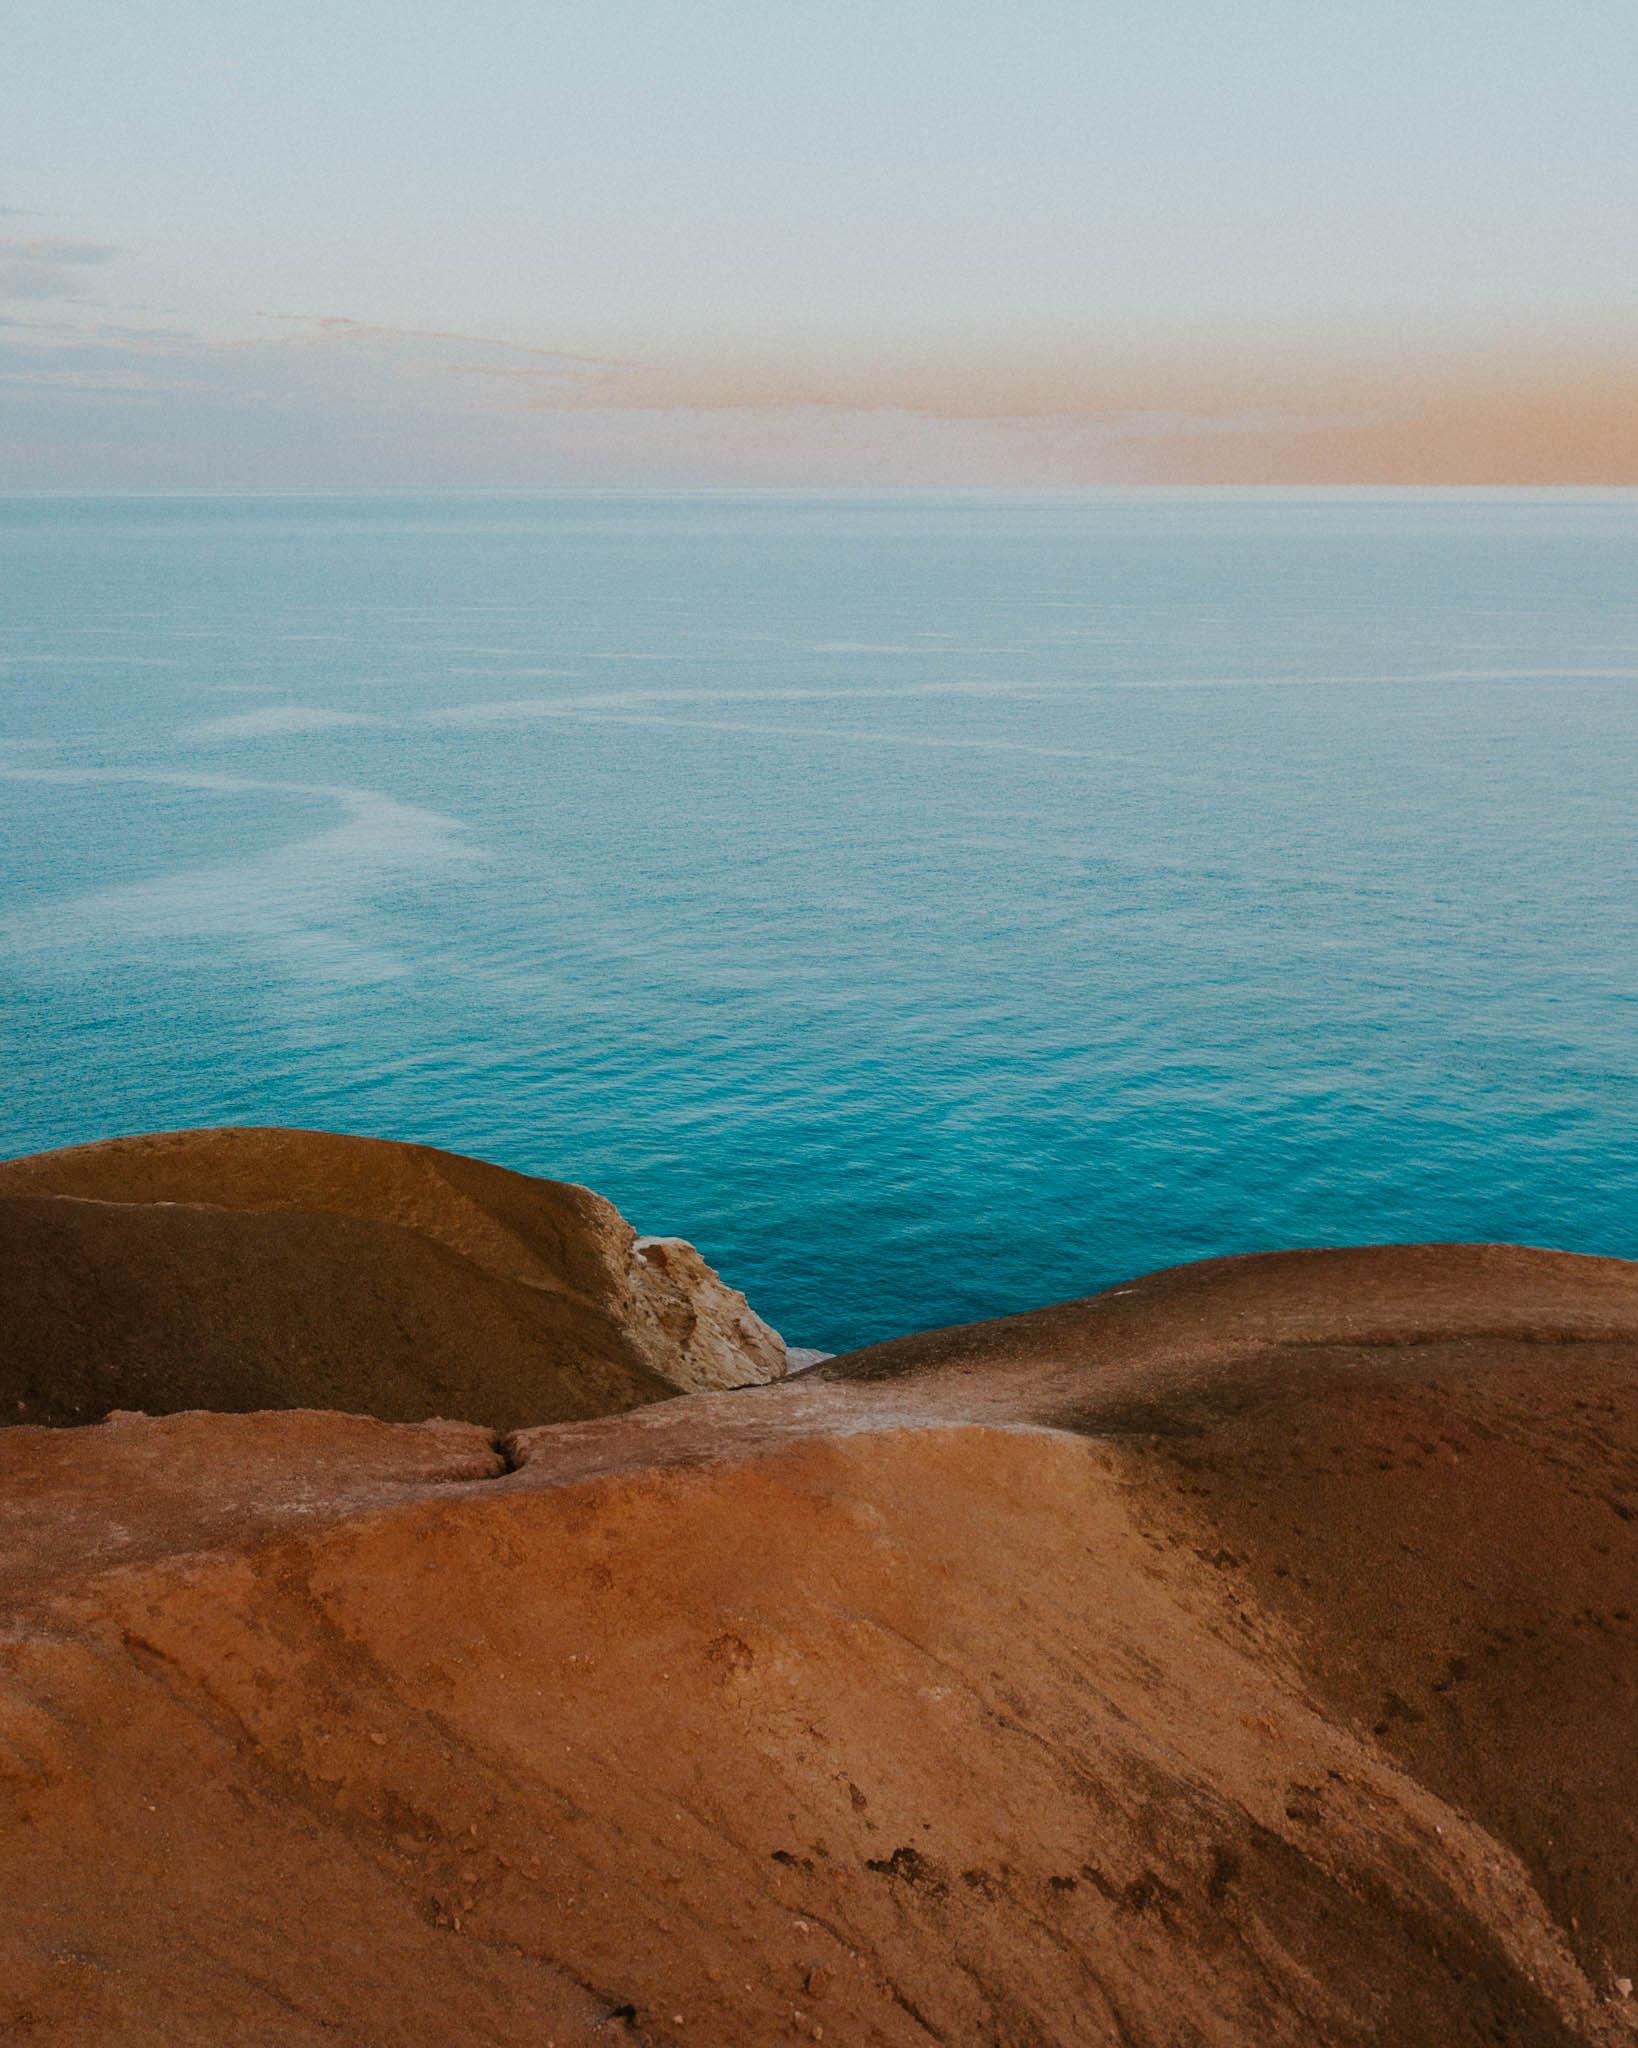 sand-shore-south-australia-benjaminandrew.jpg